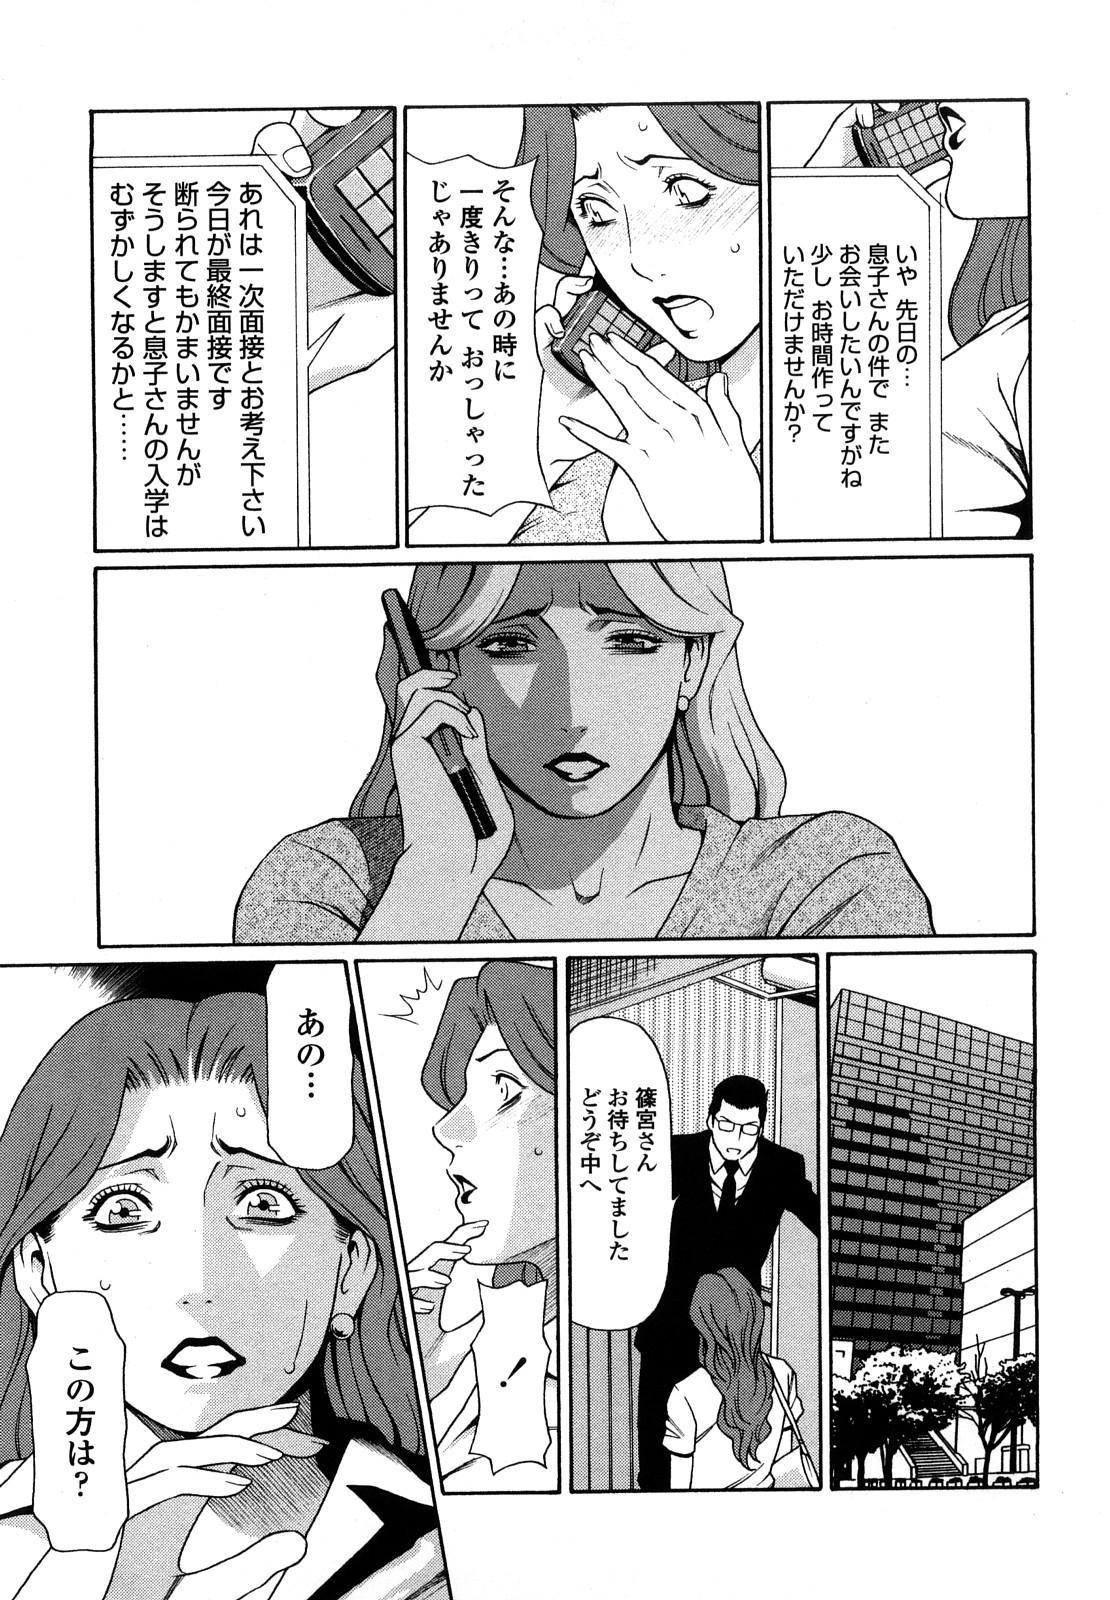 [Takasugi Kou] Kindan no Haha-Ana - Immorality Love-Hole [Decensored] 90